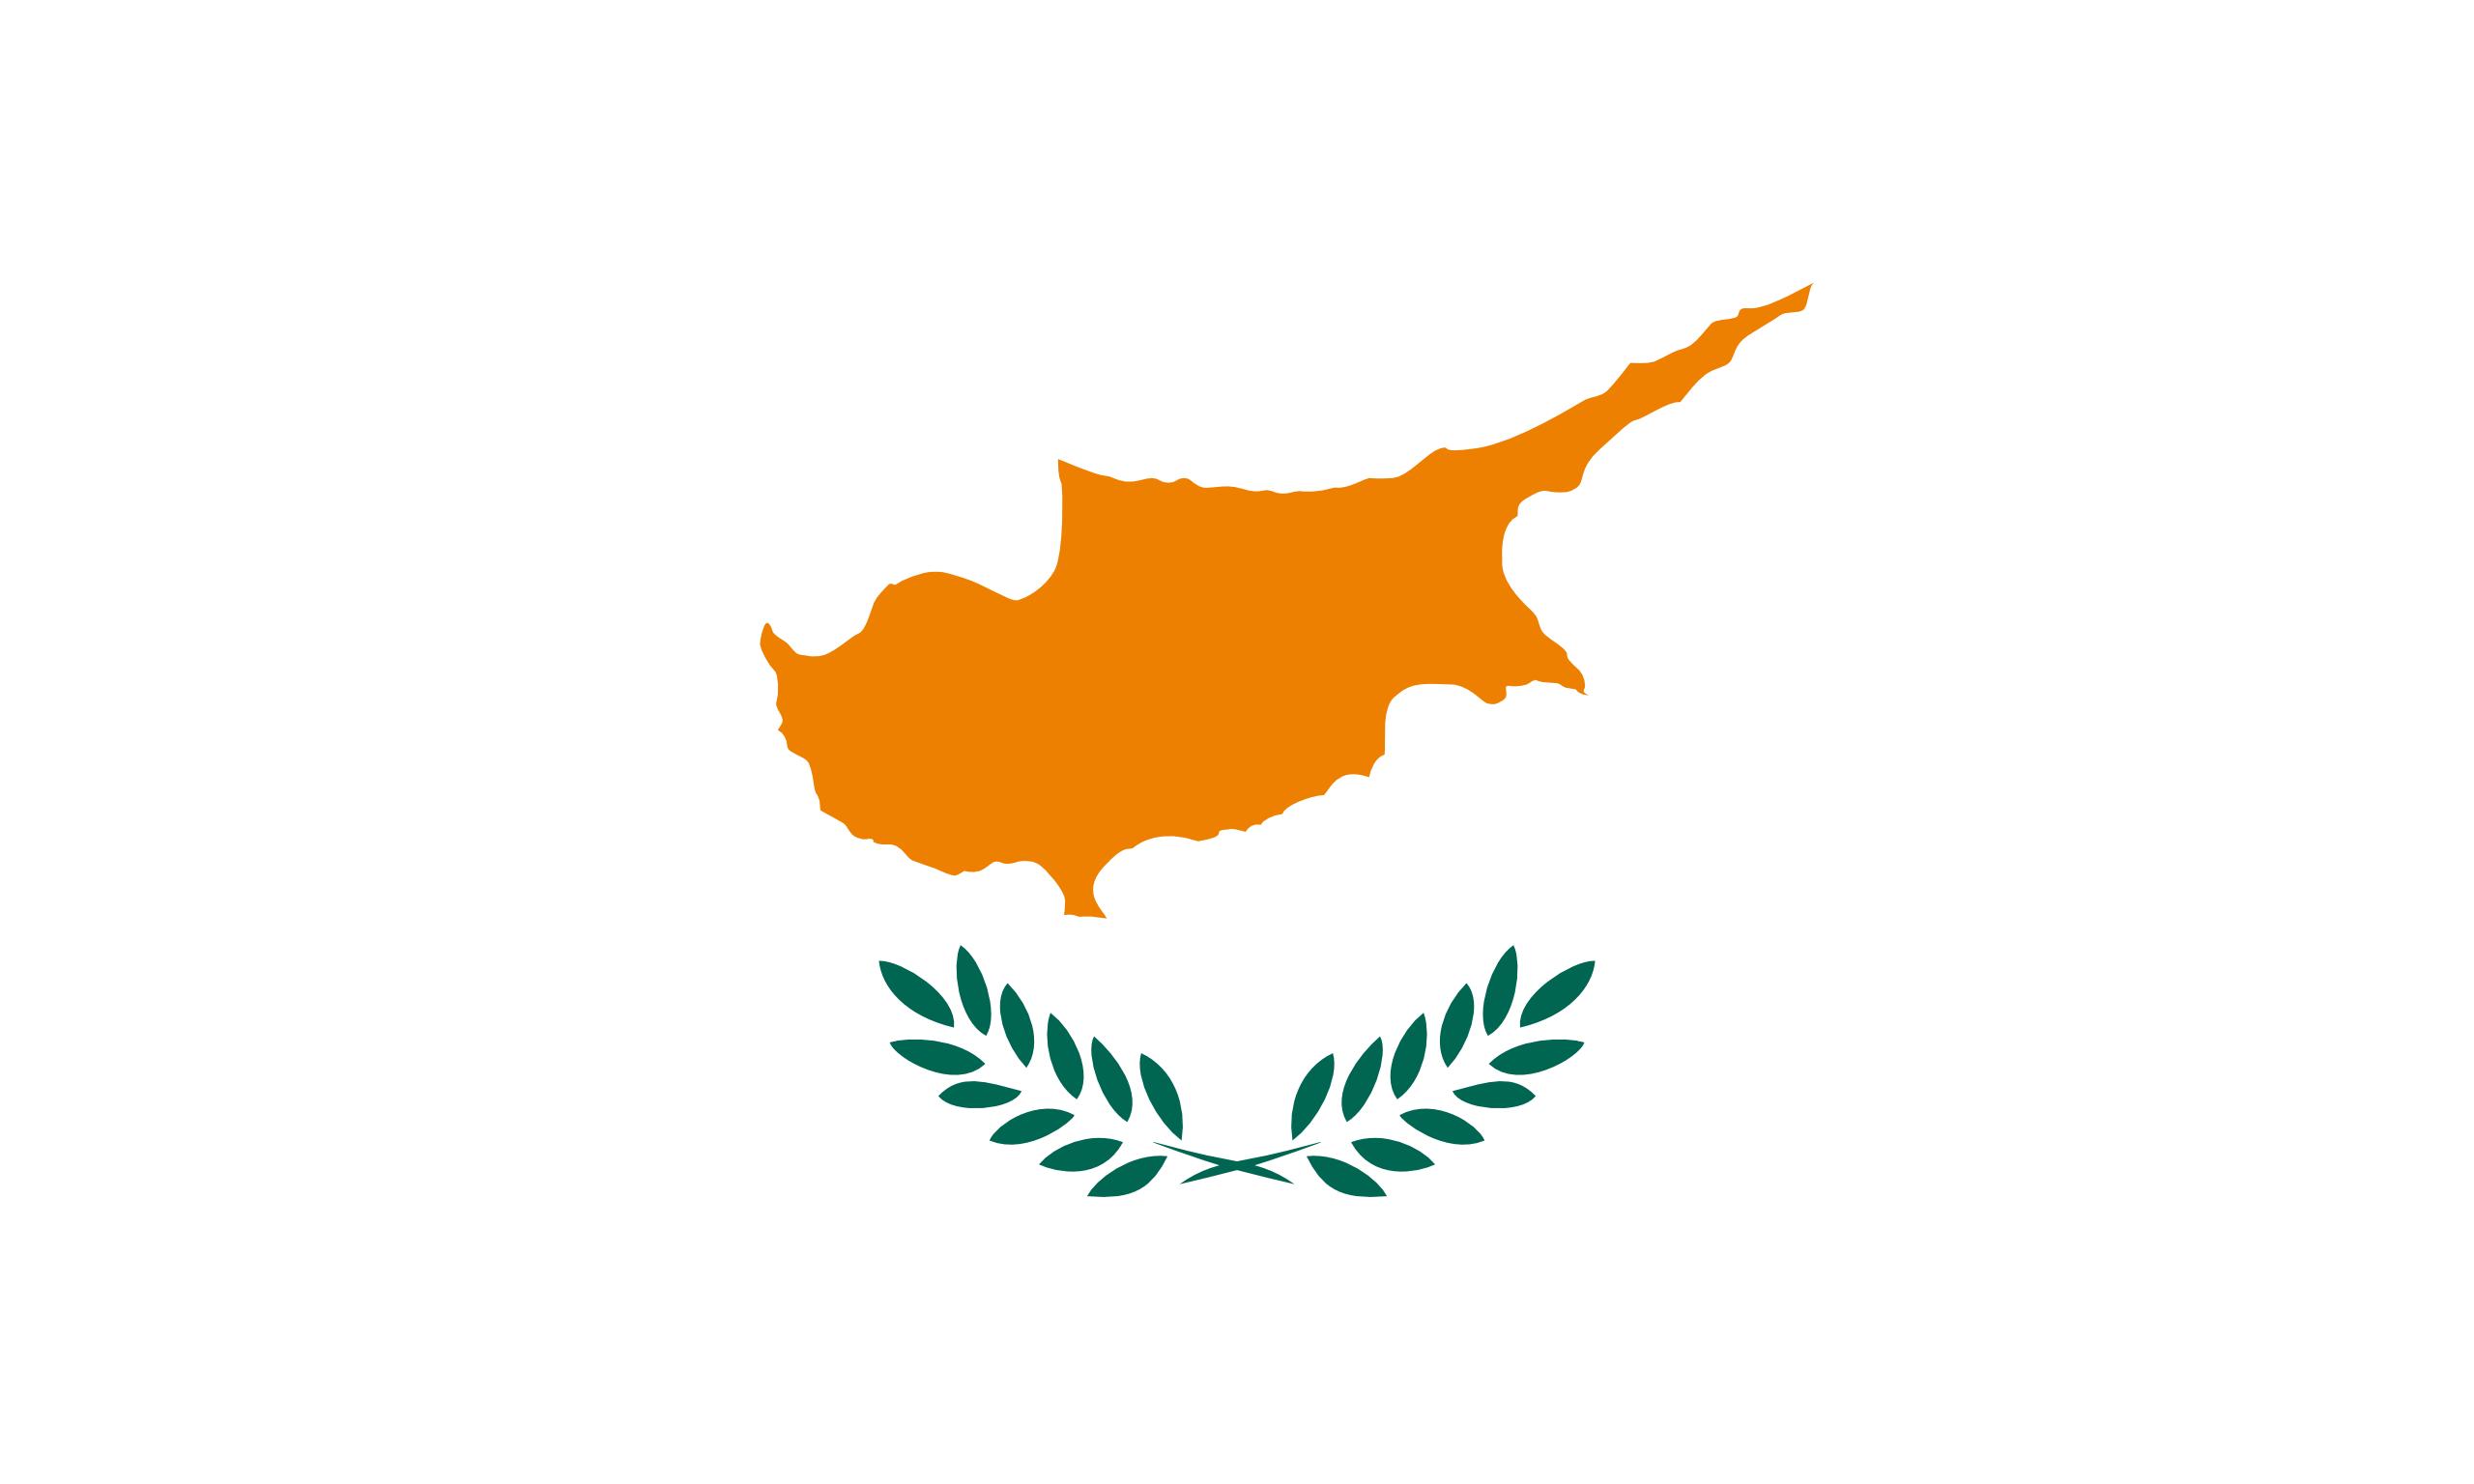 chipre, país, emblema, insignia, प्रतीक - HD वॉलपेपर - प्रोफेसर-falken.com